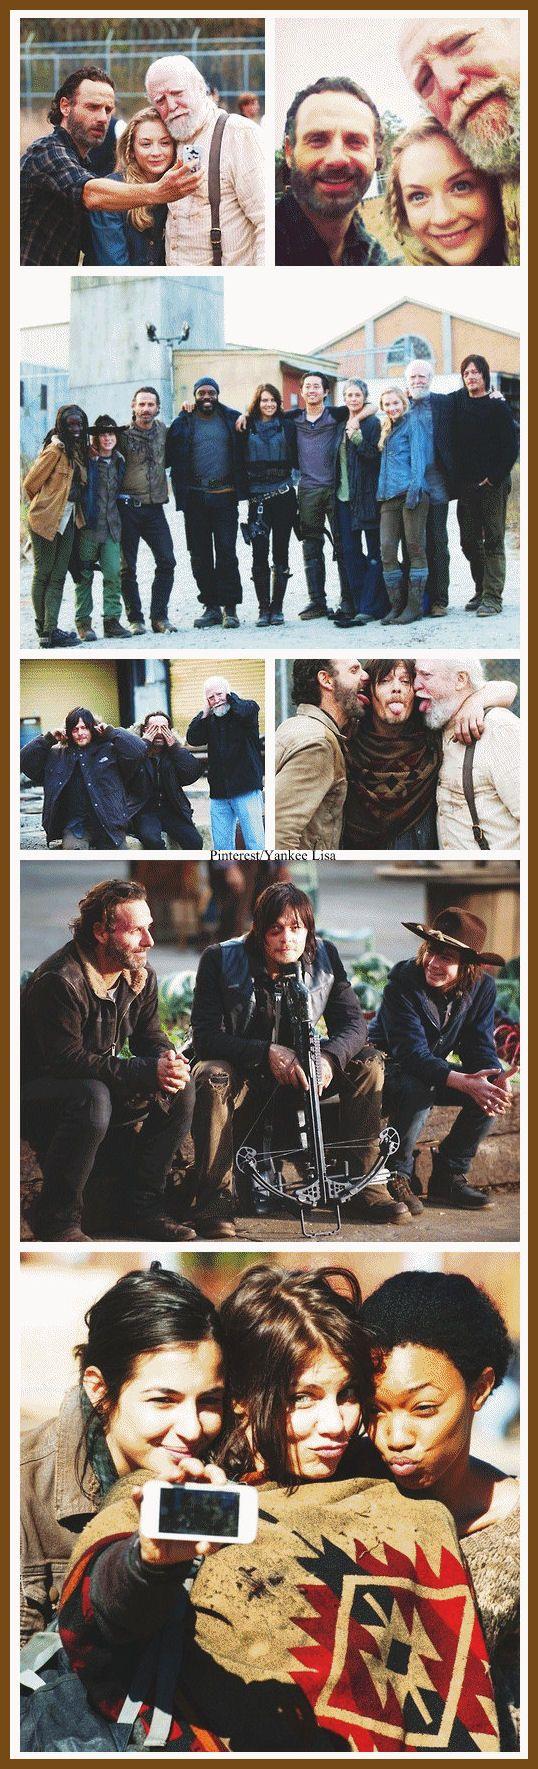 TWD Cast - Andrew LIncoln - Norman Reedus Steven Yeun - Lauren Cohan - Emily Kinney - Chandler Riggs, etc Love LOve LOVE!